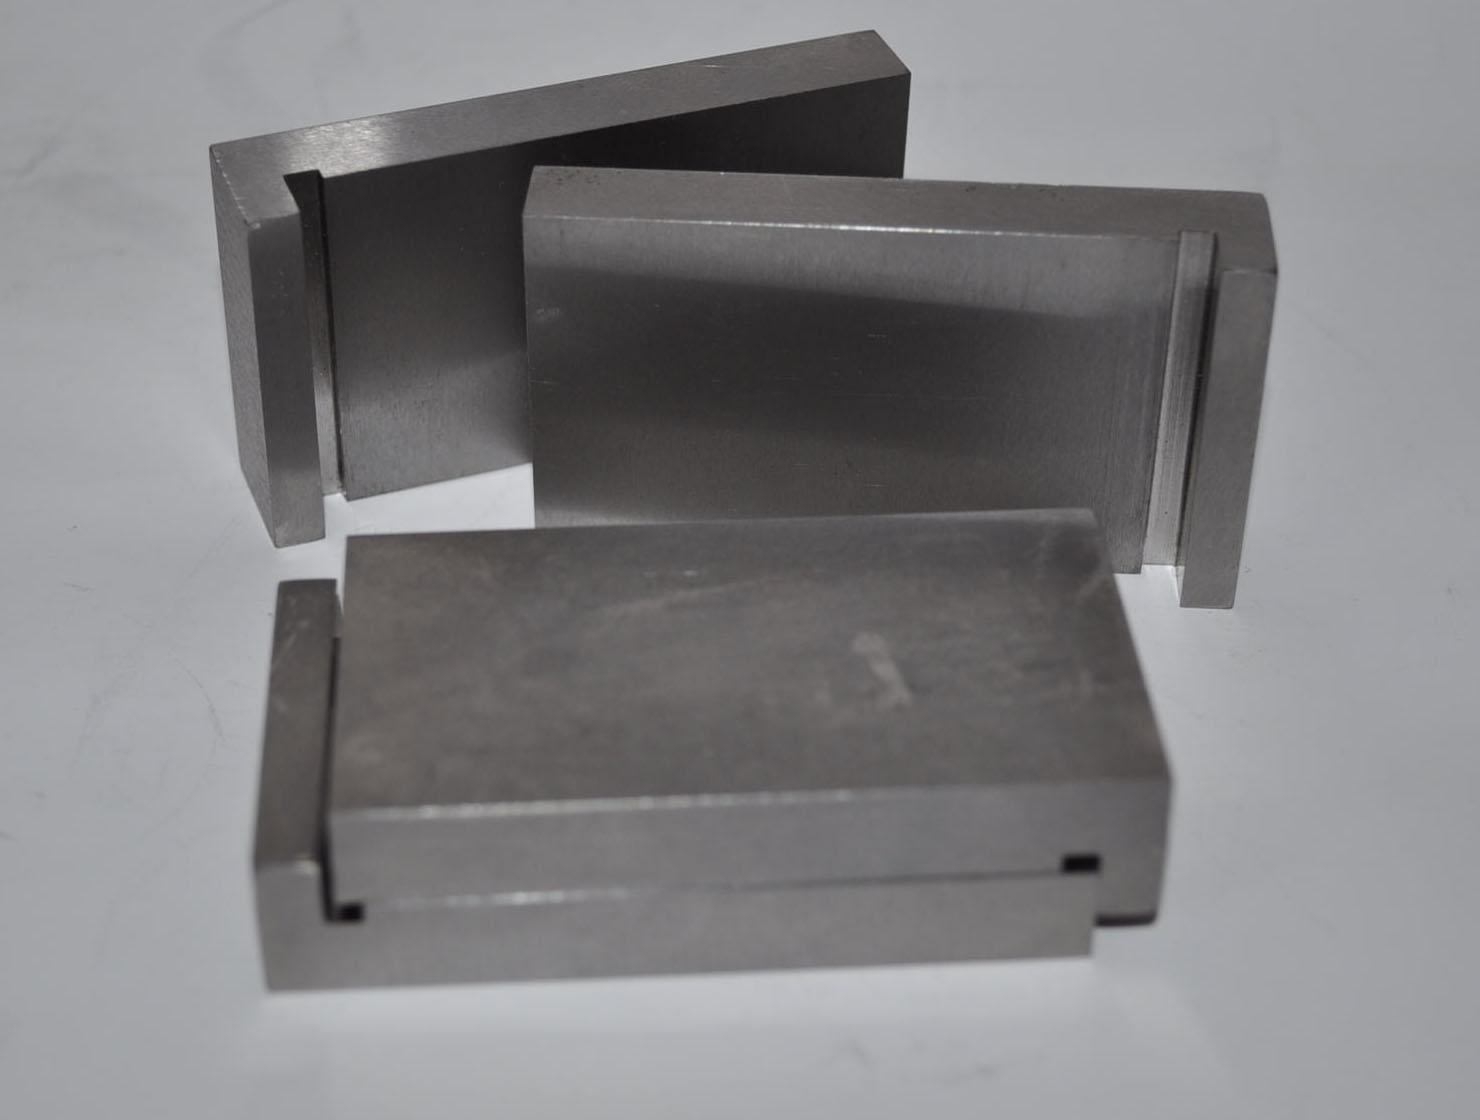 3.48. Пластины д/передачи нагрузки ПЛБ при испытании на сжатие половинок балочек 40х40х160 мм (к-т 2 шт)